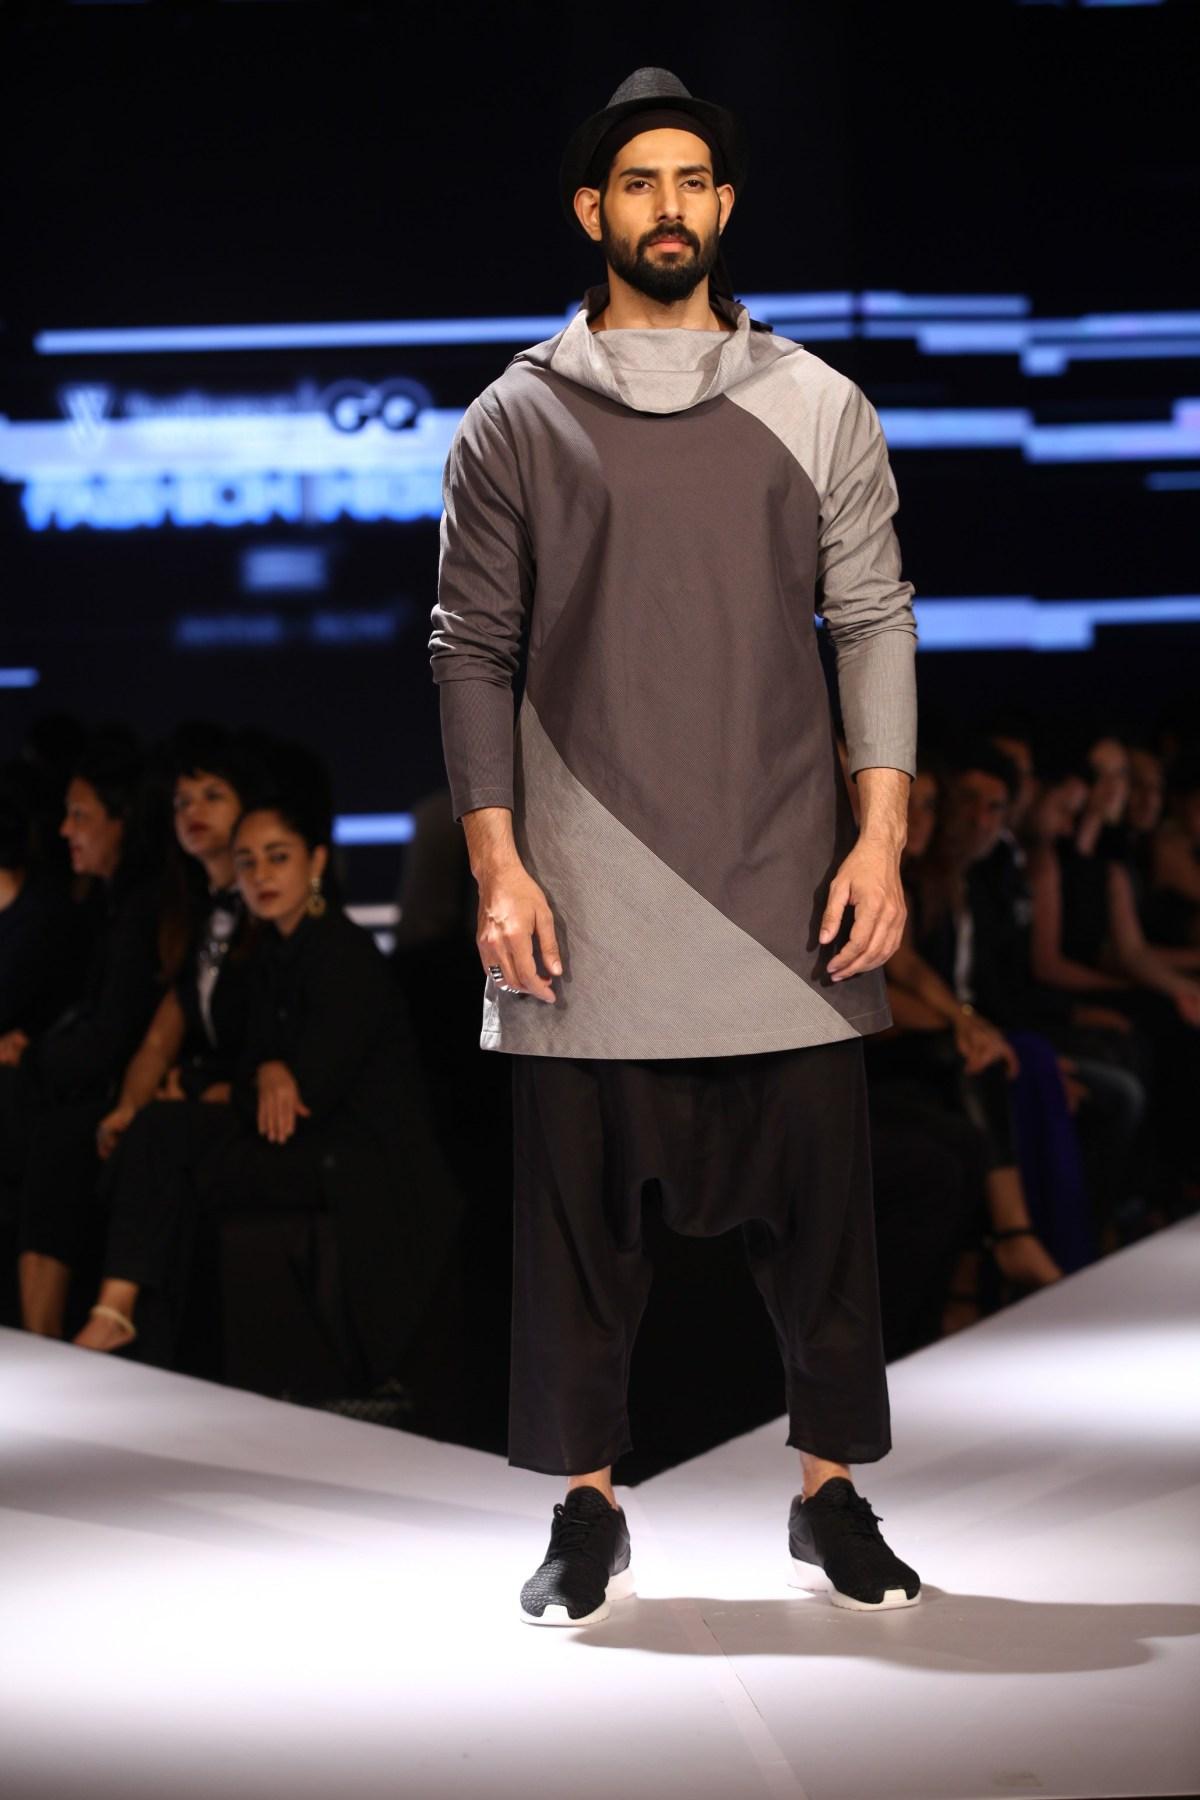 Model in Ujjawal Dubey on Day 2 of Van Heusen + GQ Fashion Nights (5)